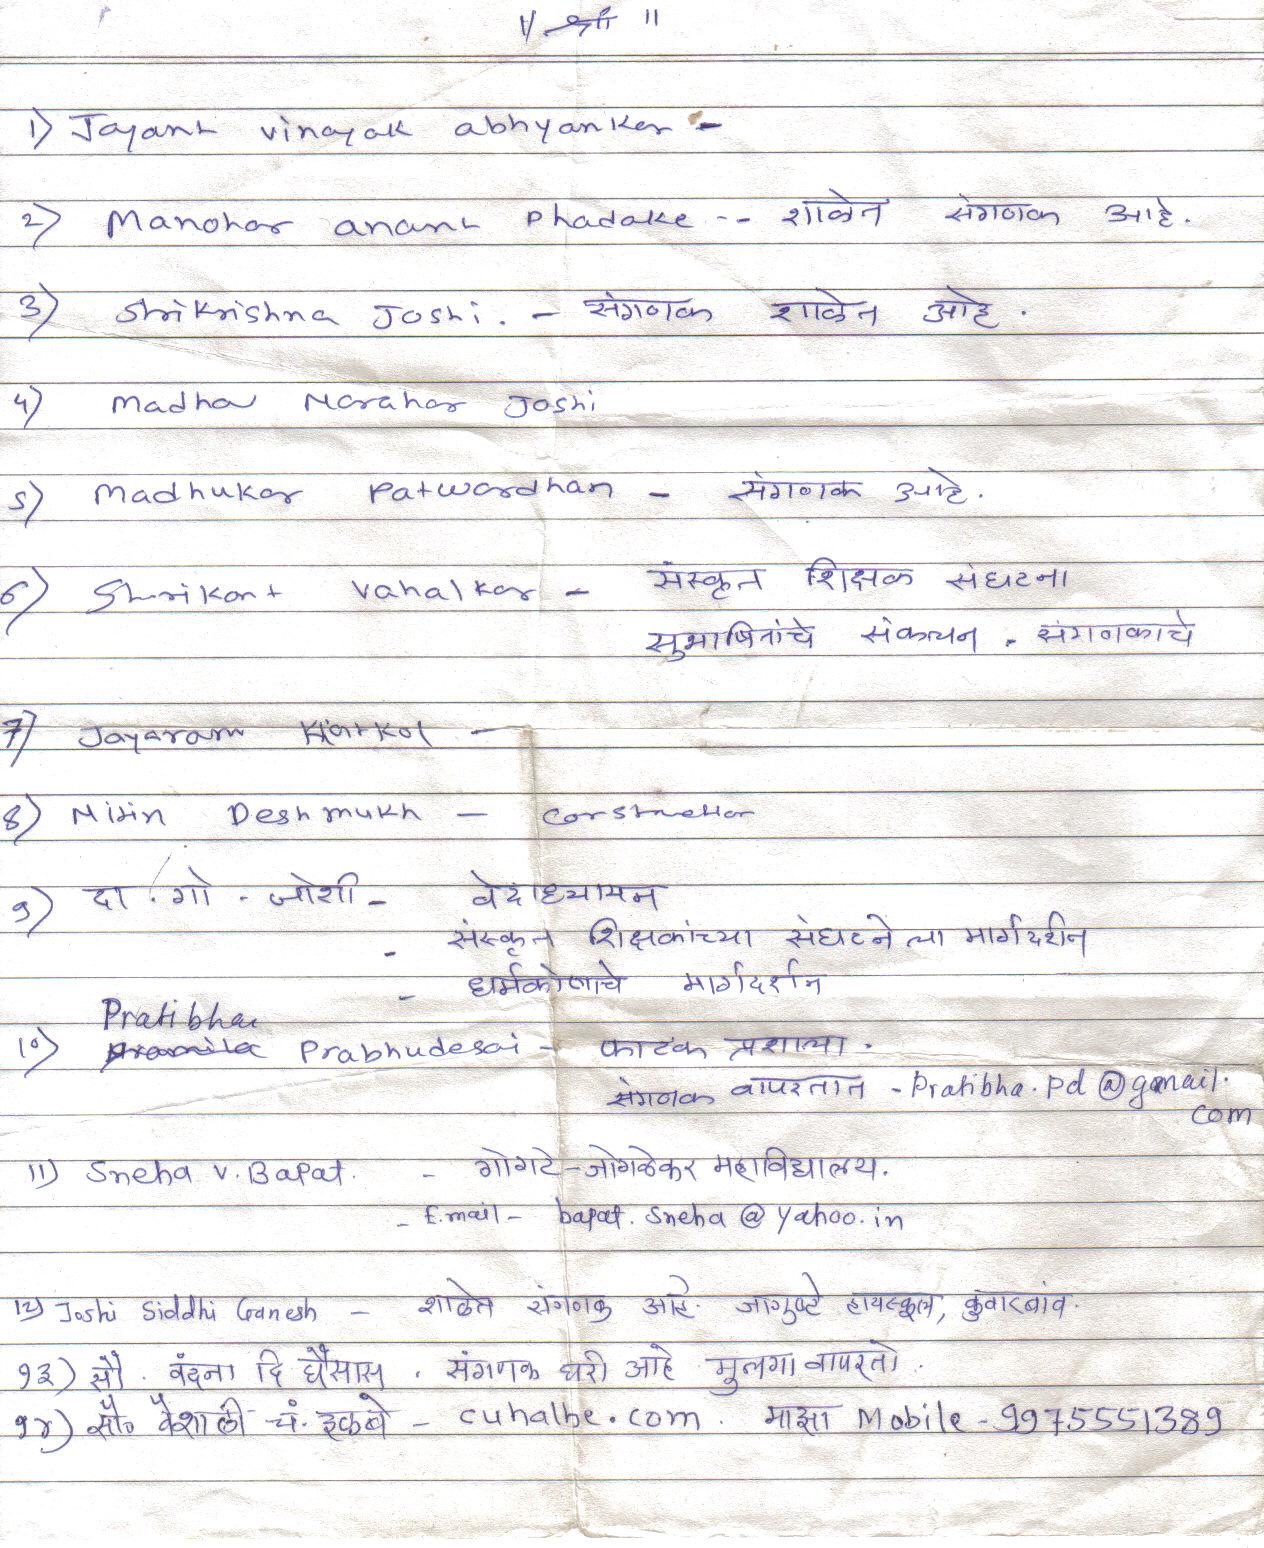 gujarati essay essay on different topics gujarati love letter errant bahus civic engagement essay my mother